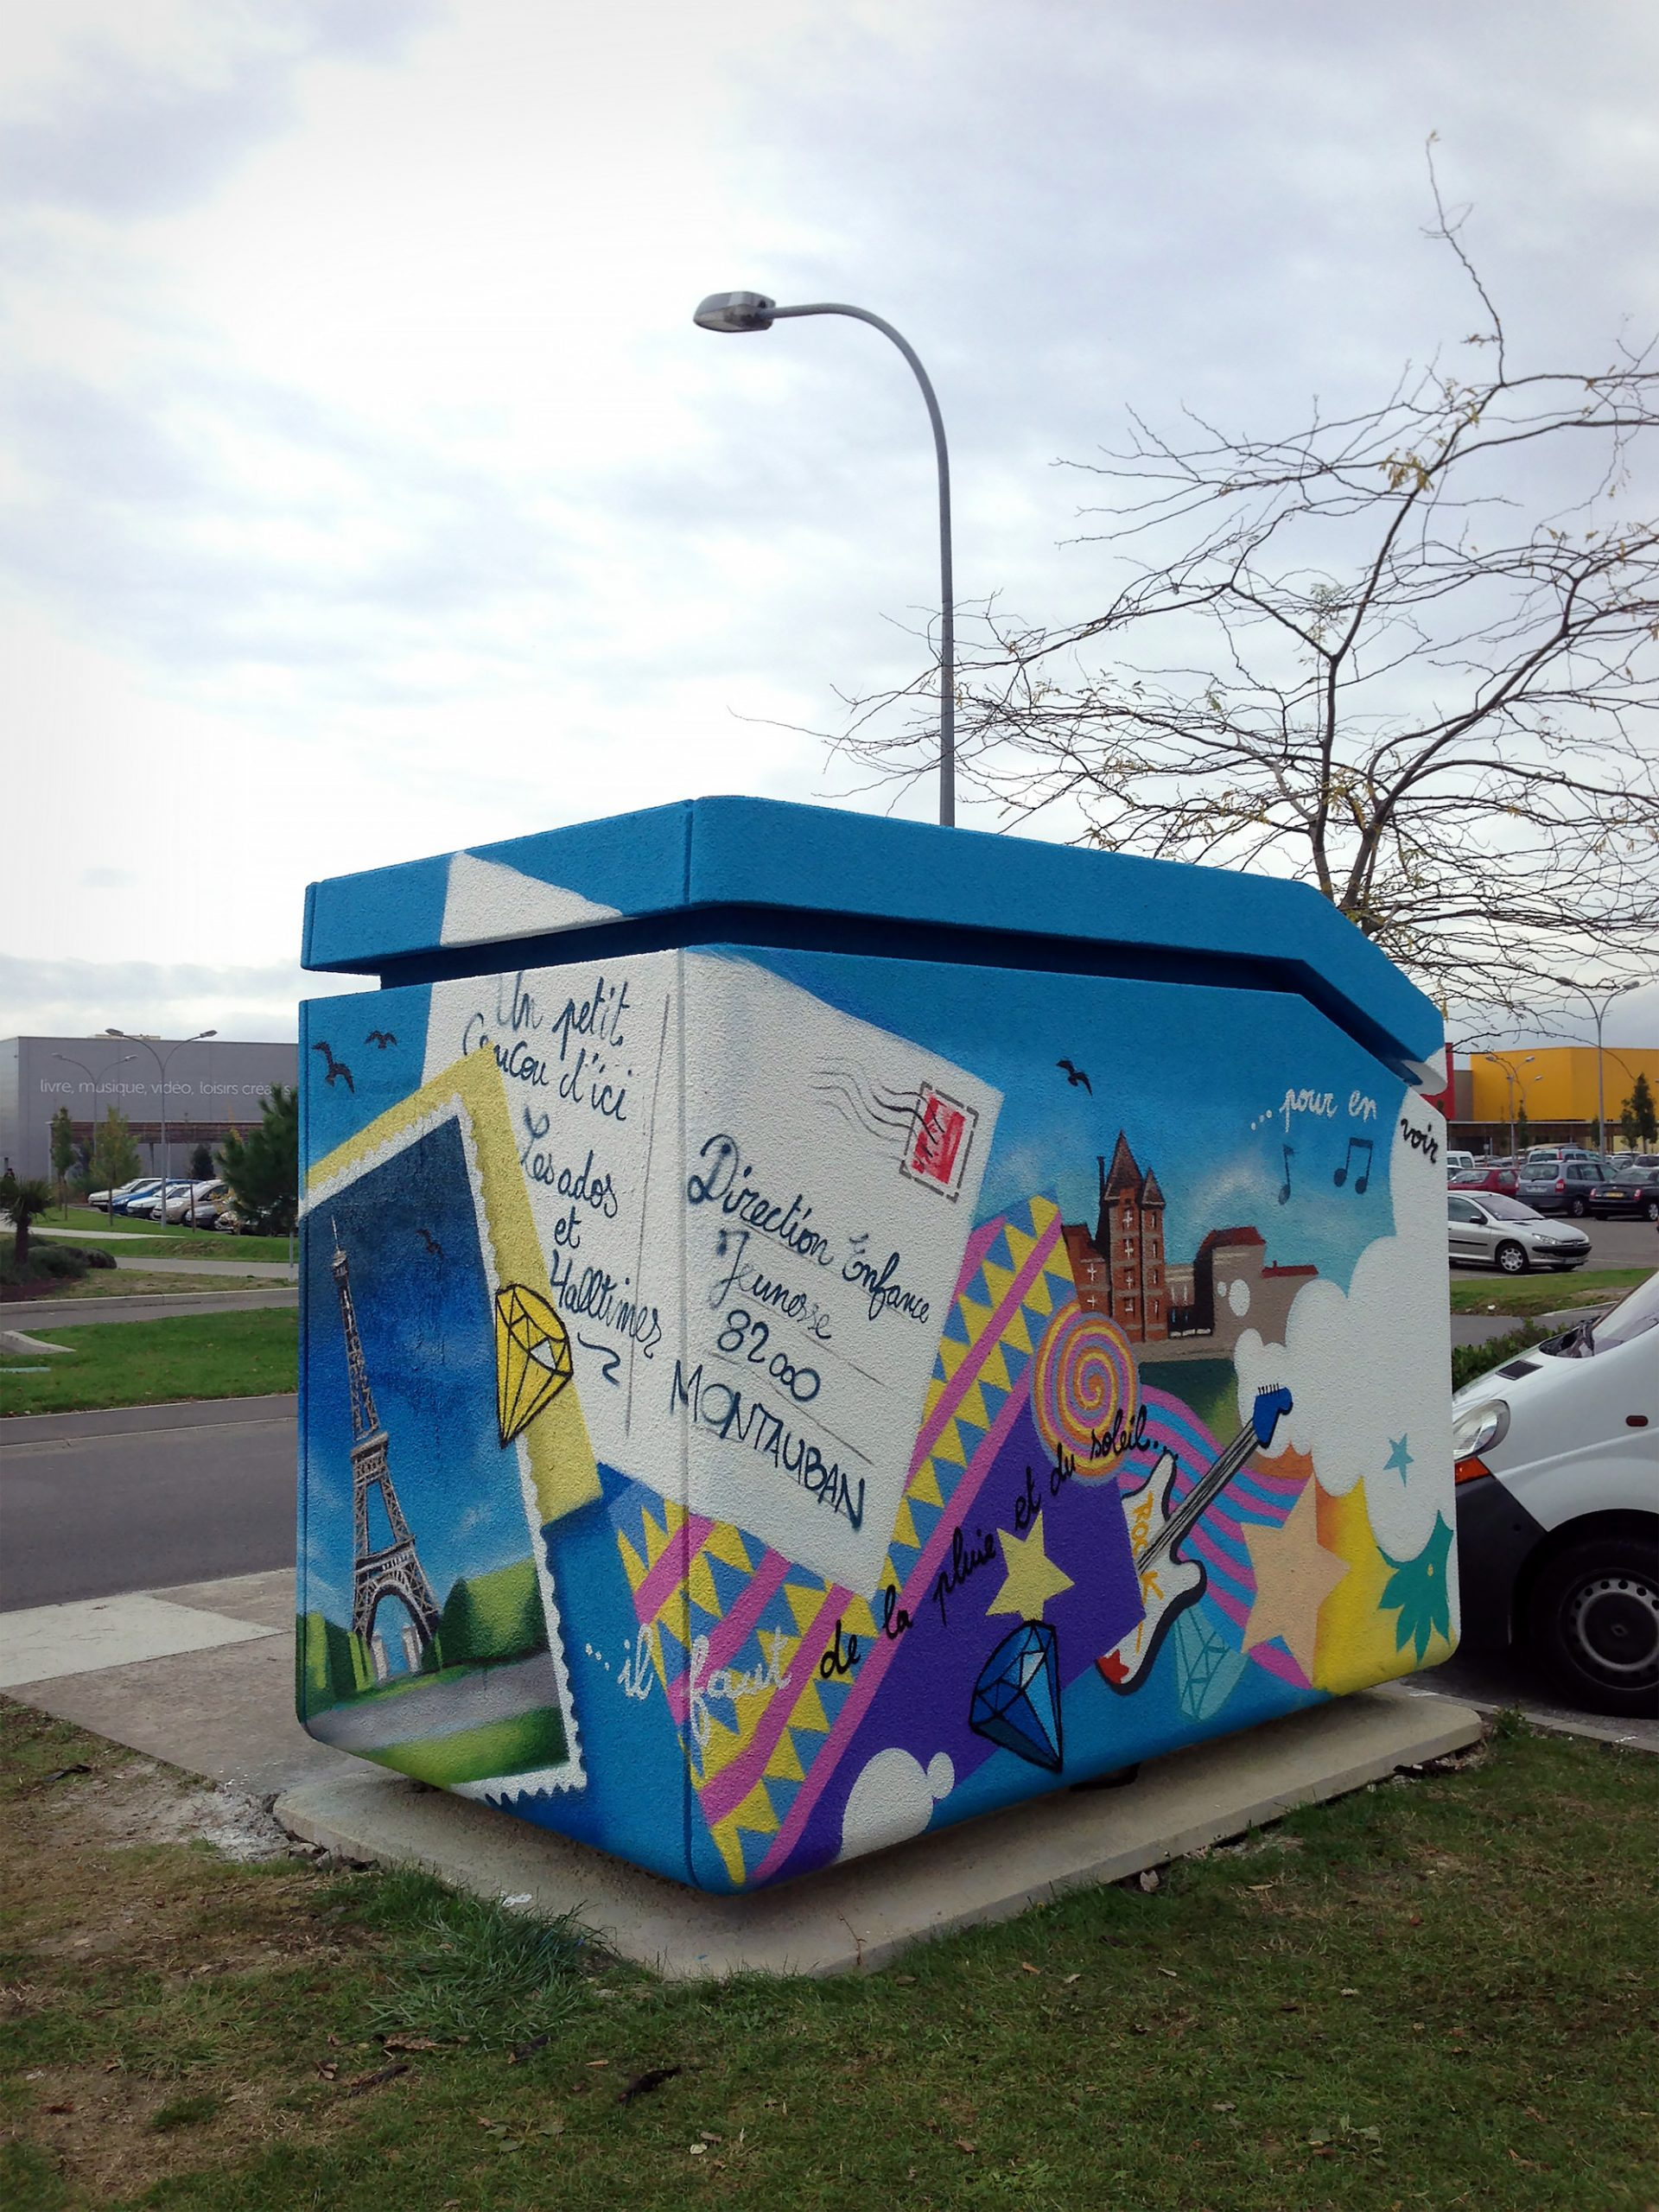 poste-transformation-graffiti-montauban-graffeur-halltimes